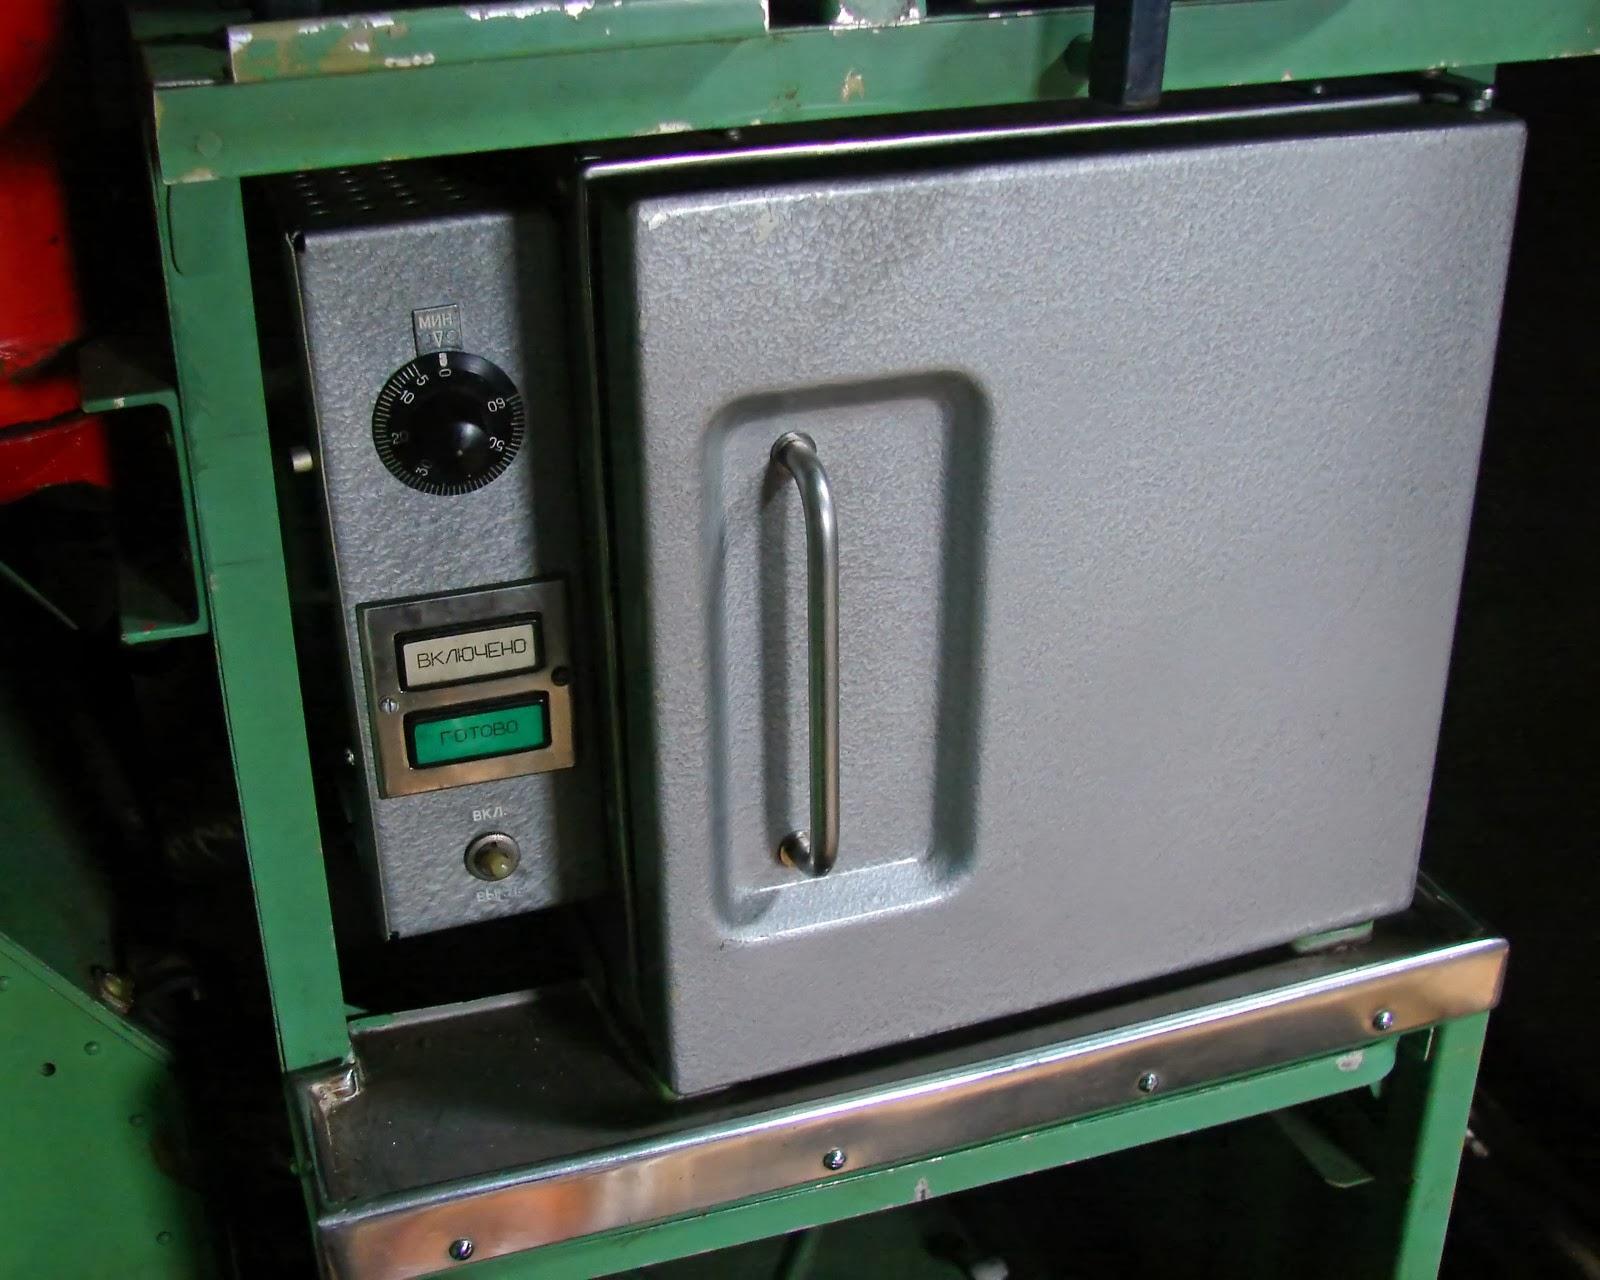 Кабина Ту-95: советский аналог микроволновки (шкафчик с электроподогревом)